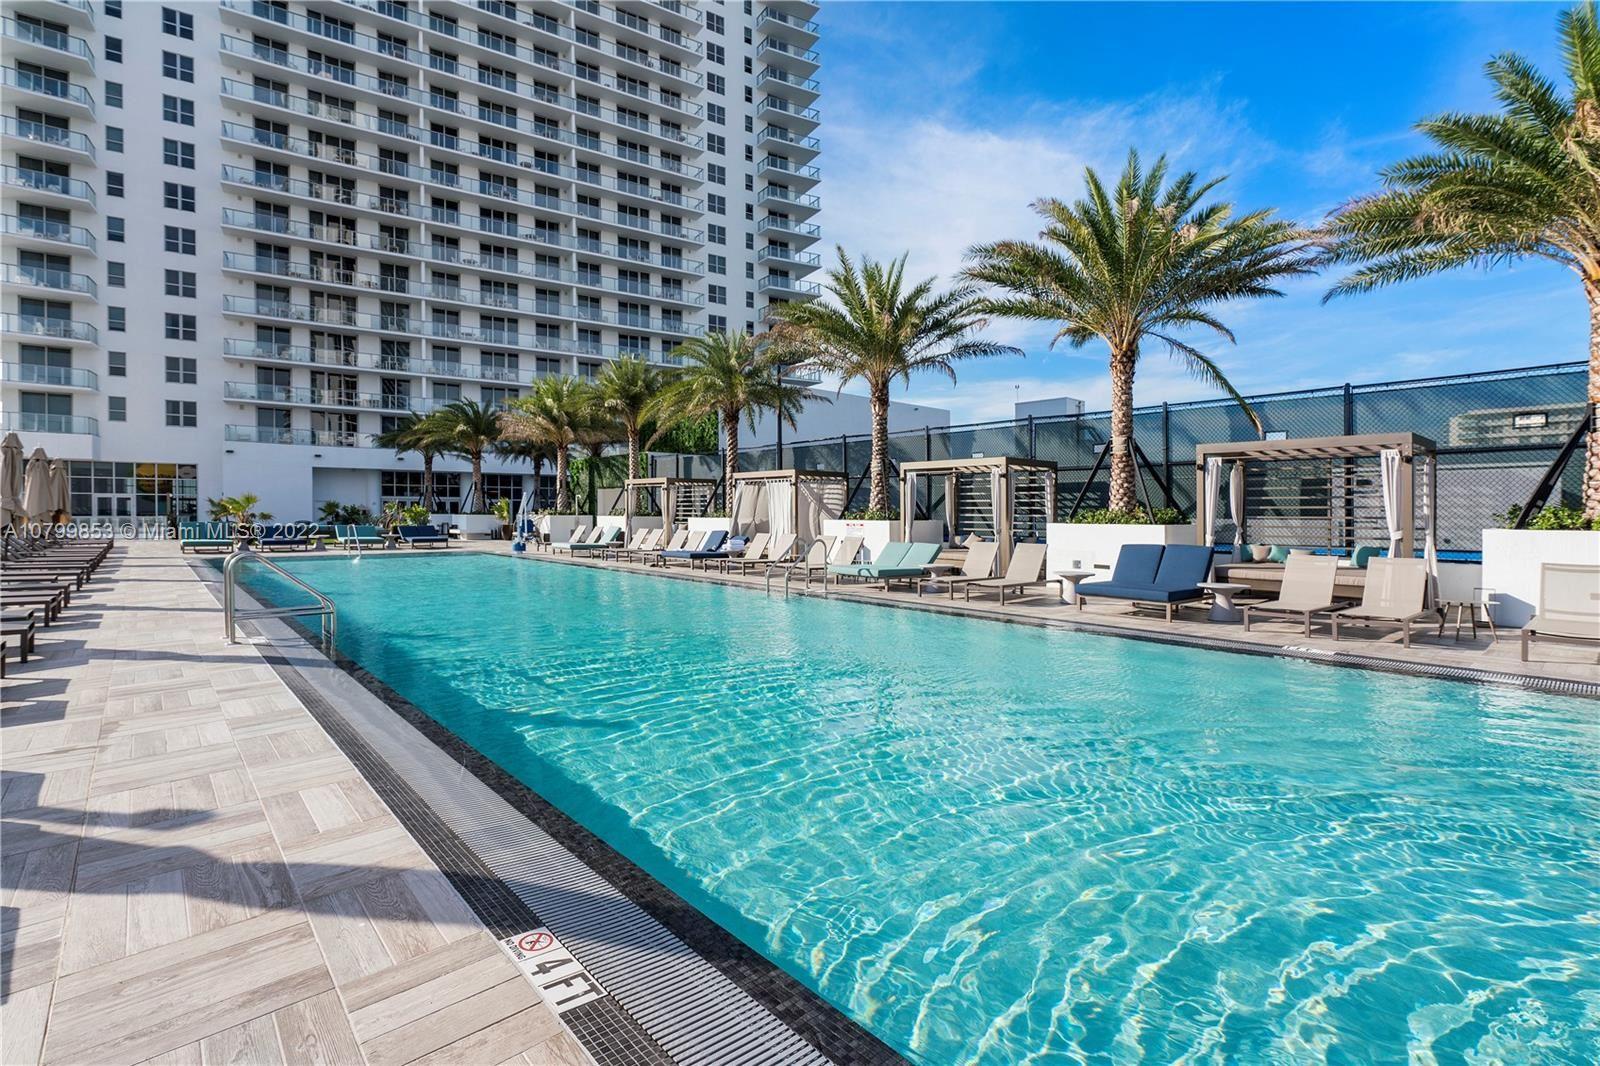 4010 S Ocean Dr #3406, Hollywood, FL 33019 - #: A10799853